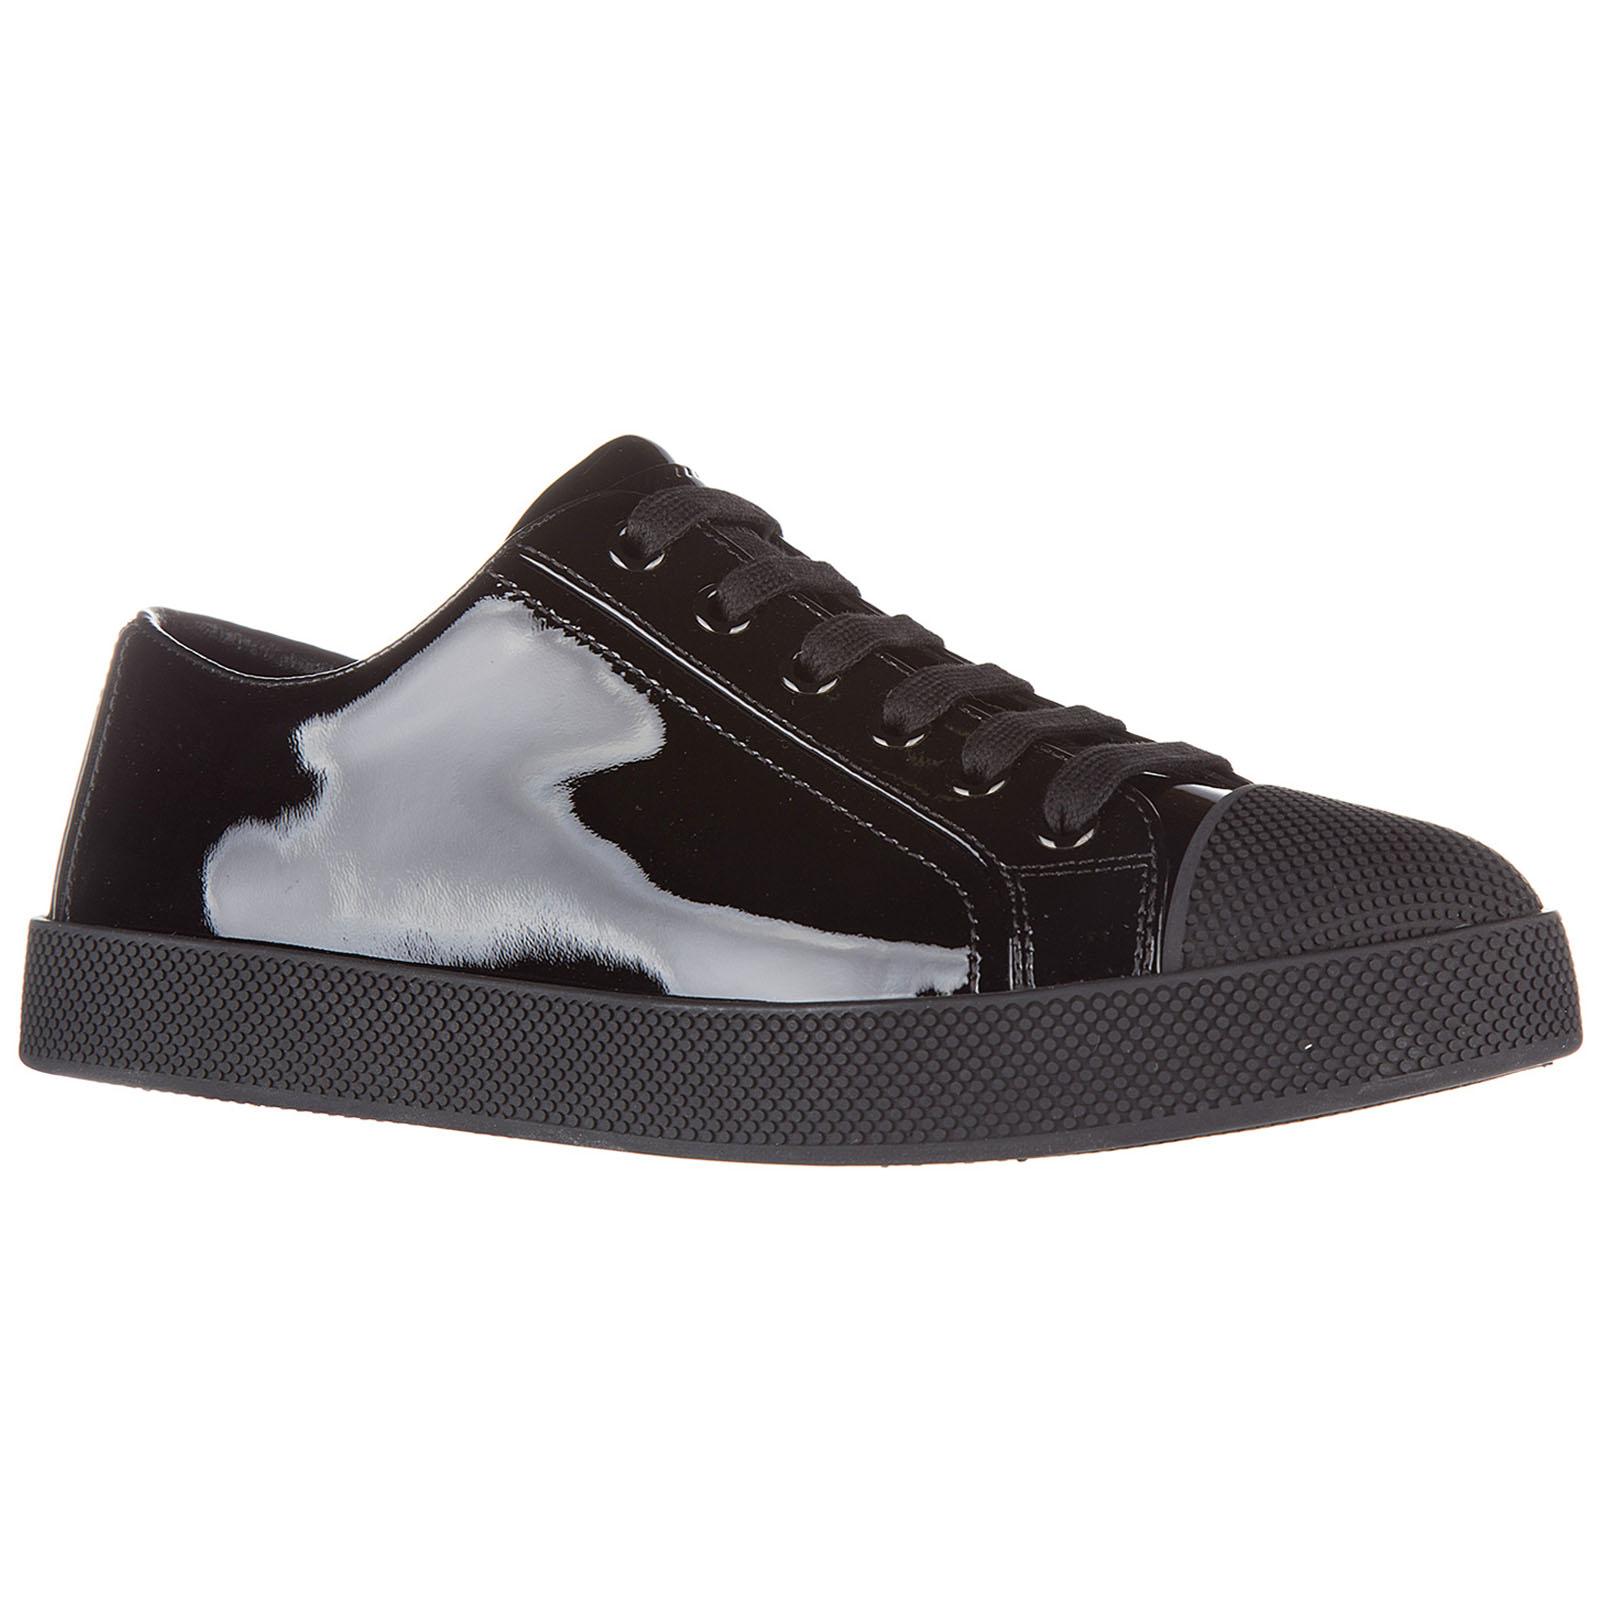 Scarpe sneakers donna in pelle vernice soft